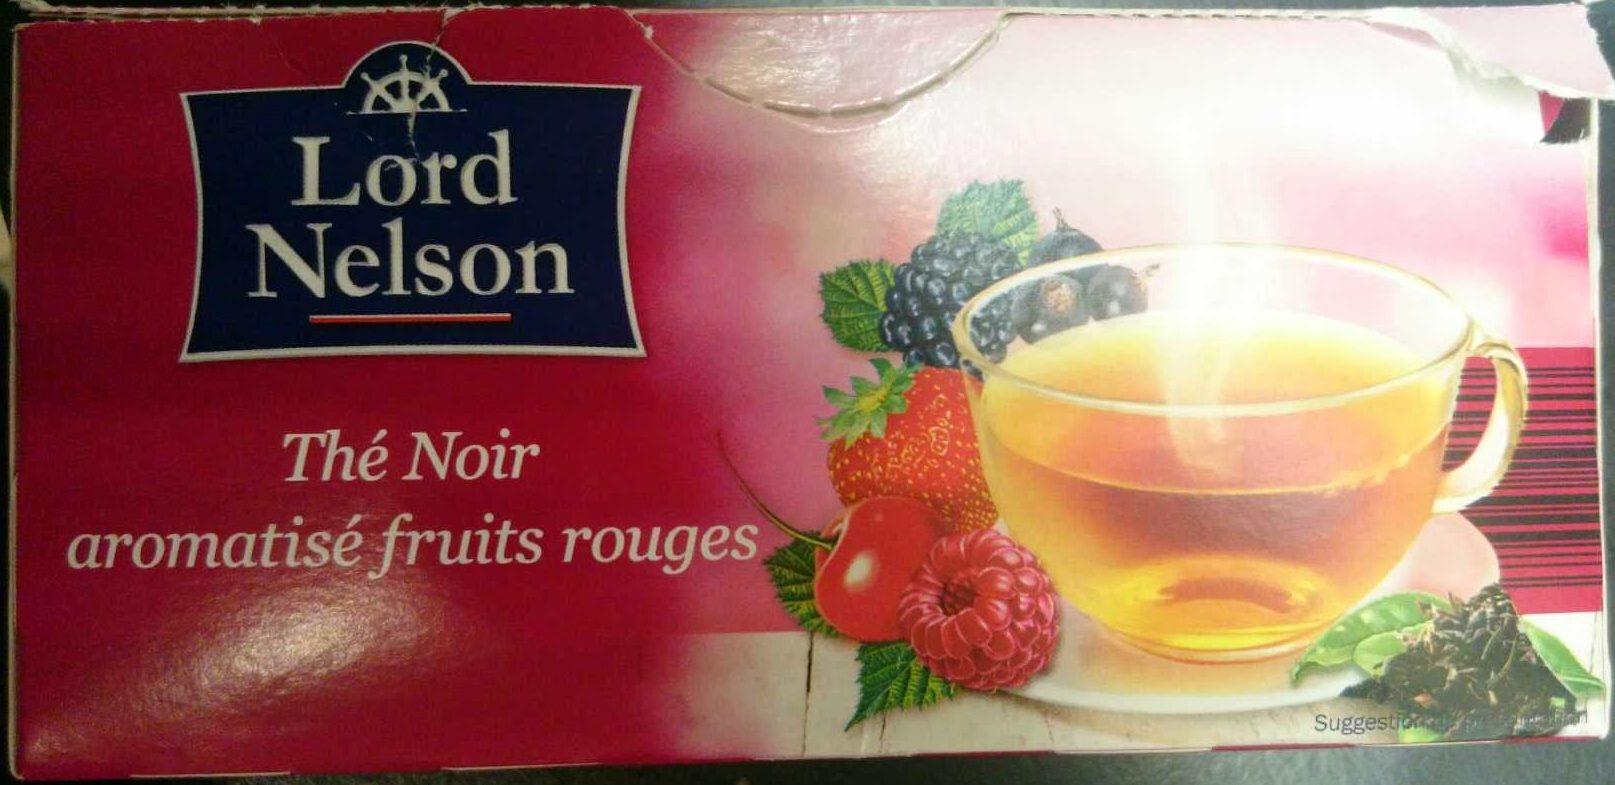 Thé Noir Aromatisé Fruits Rouges Lord Nelson 42 5 G 25 1 7 G